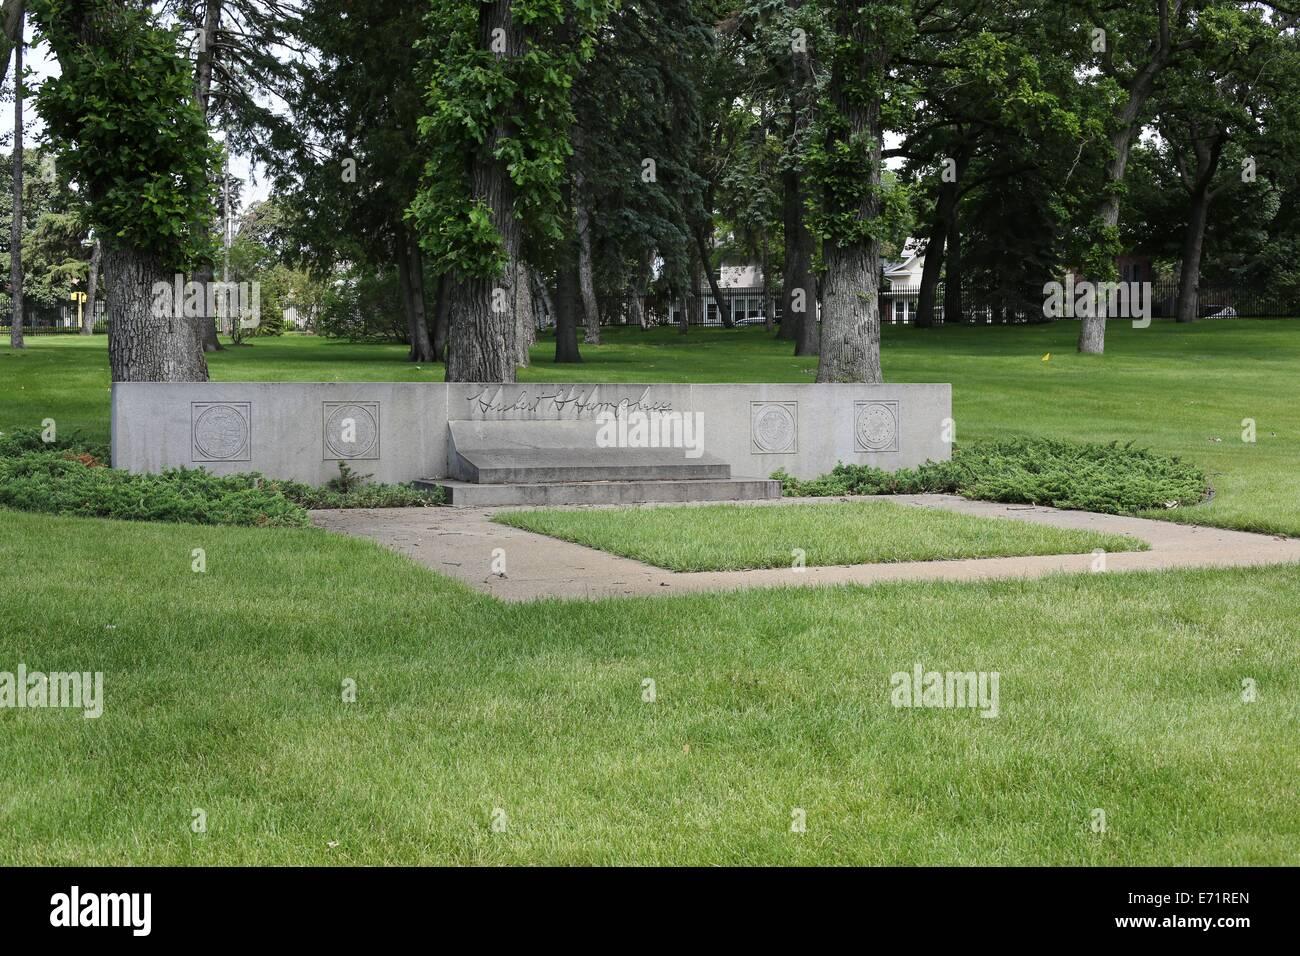 The grave of Hubert Humphrey in Lakewood Cemetery in Minneapolis, Minnesota. - Stock Image